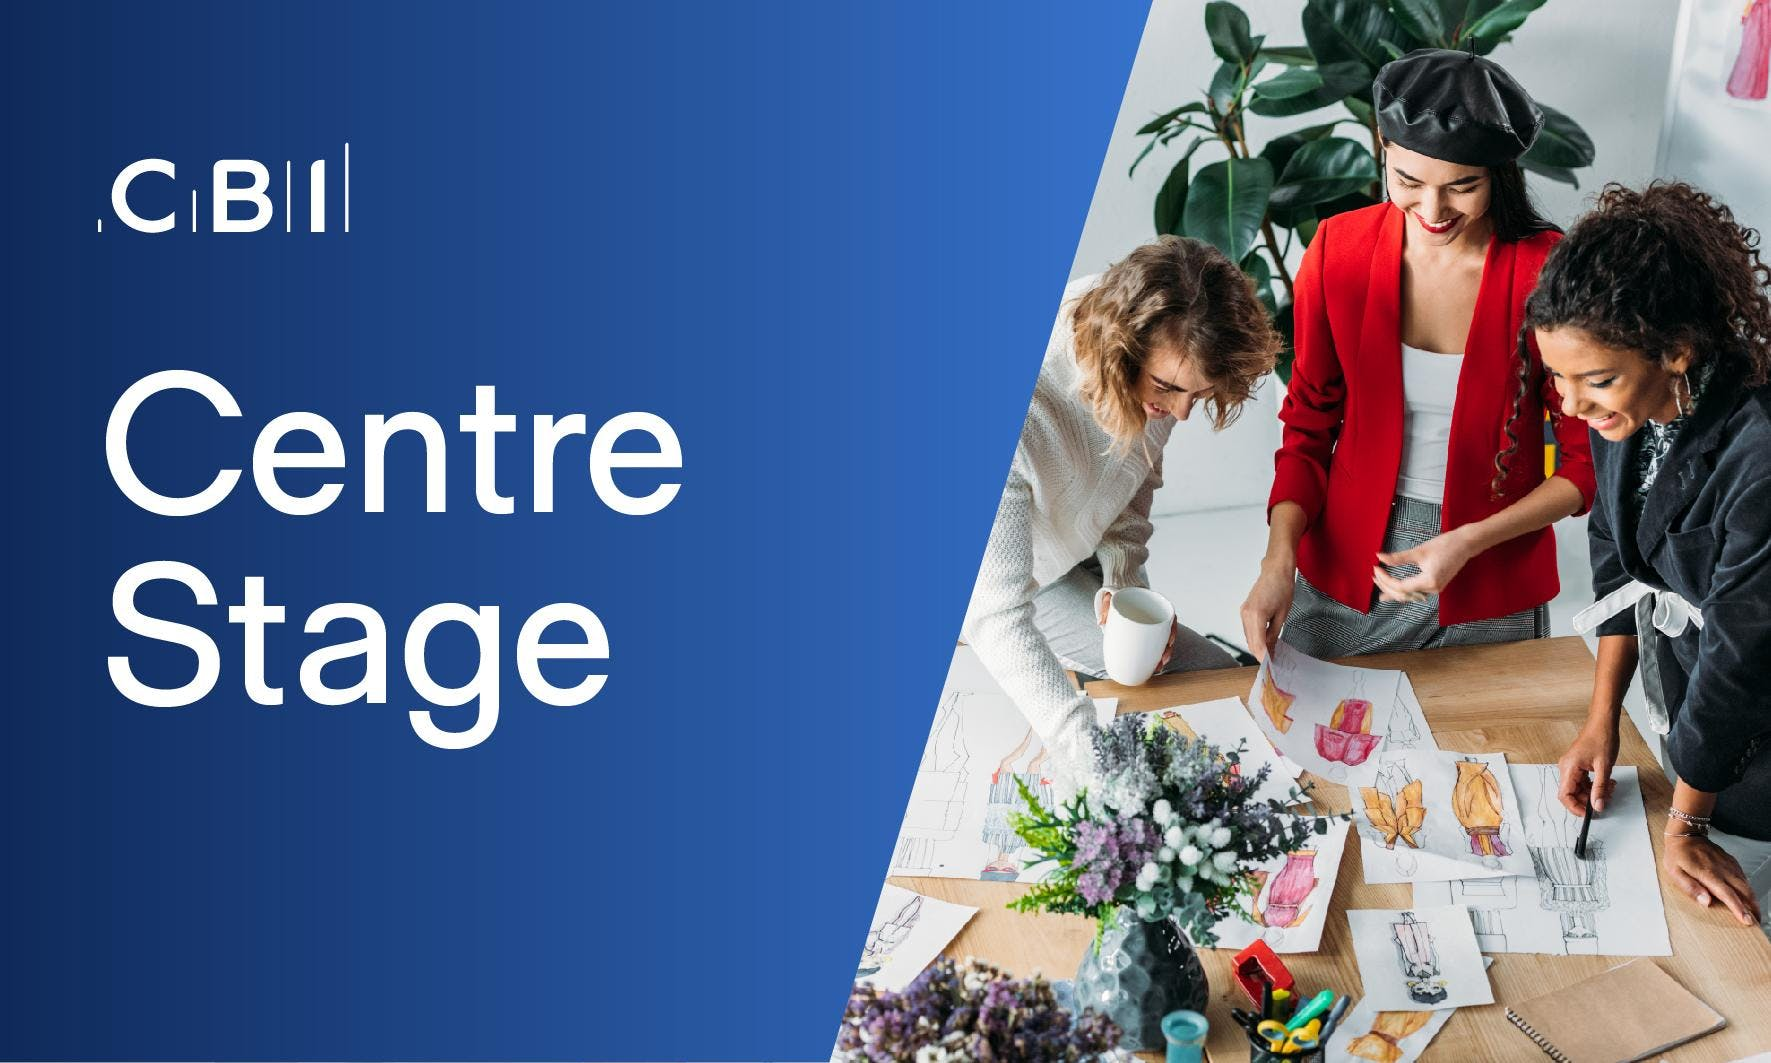 CBI Report Launch: Centre Stage